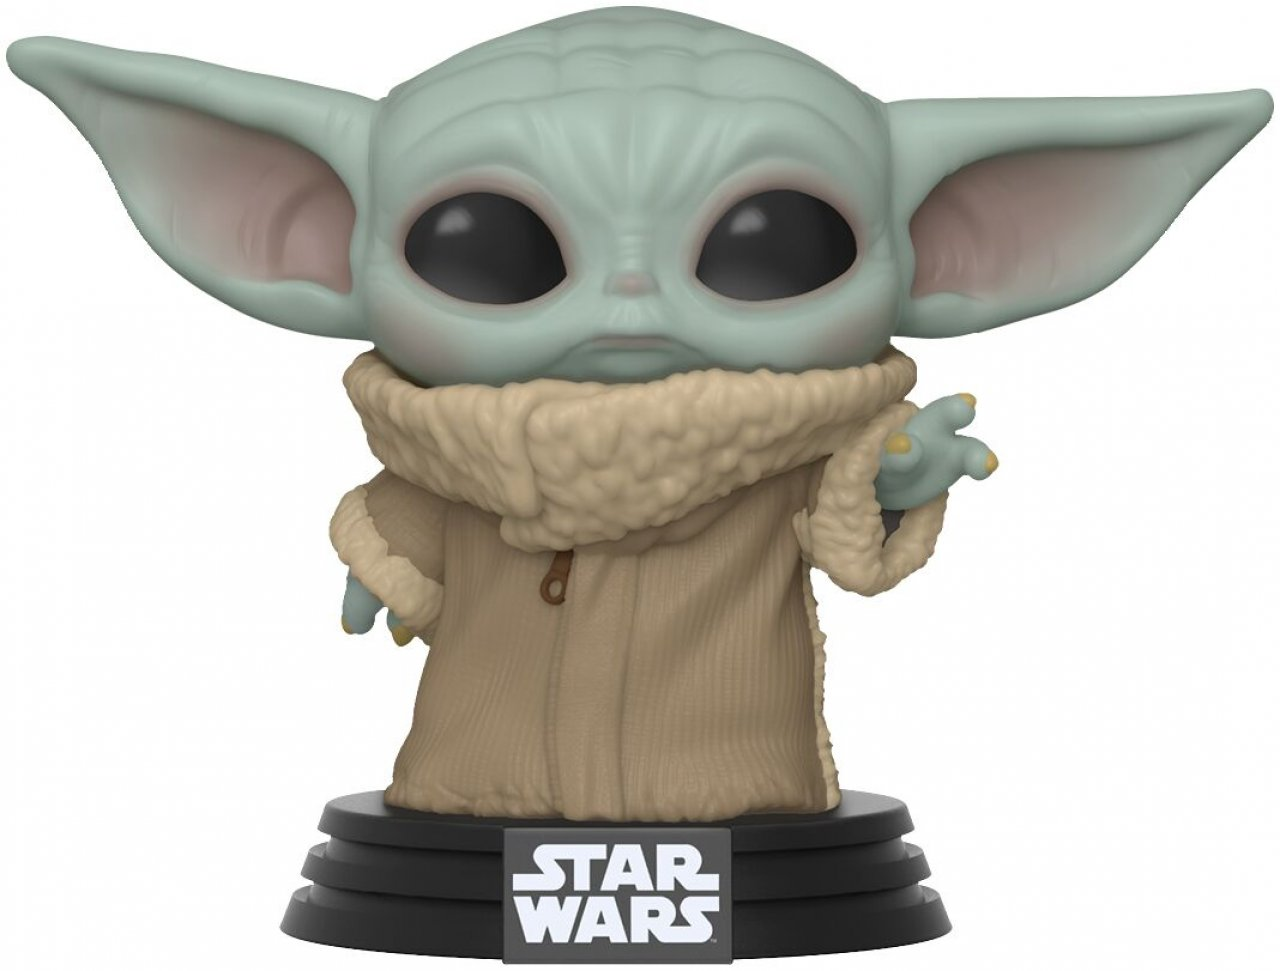 Star Wars Clone Wars Vinyl Figure Yoda Pop